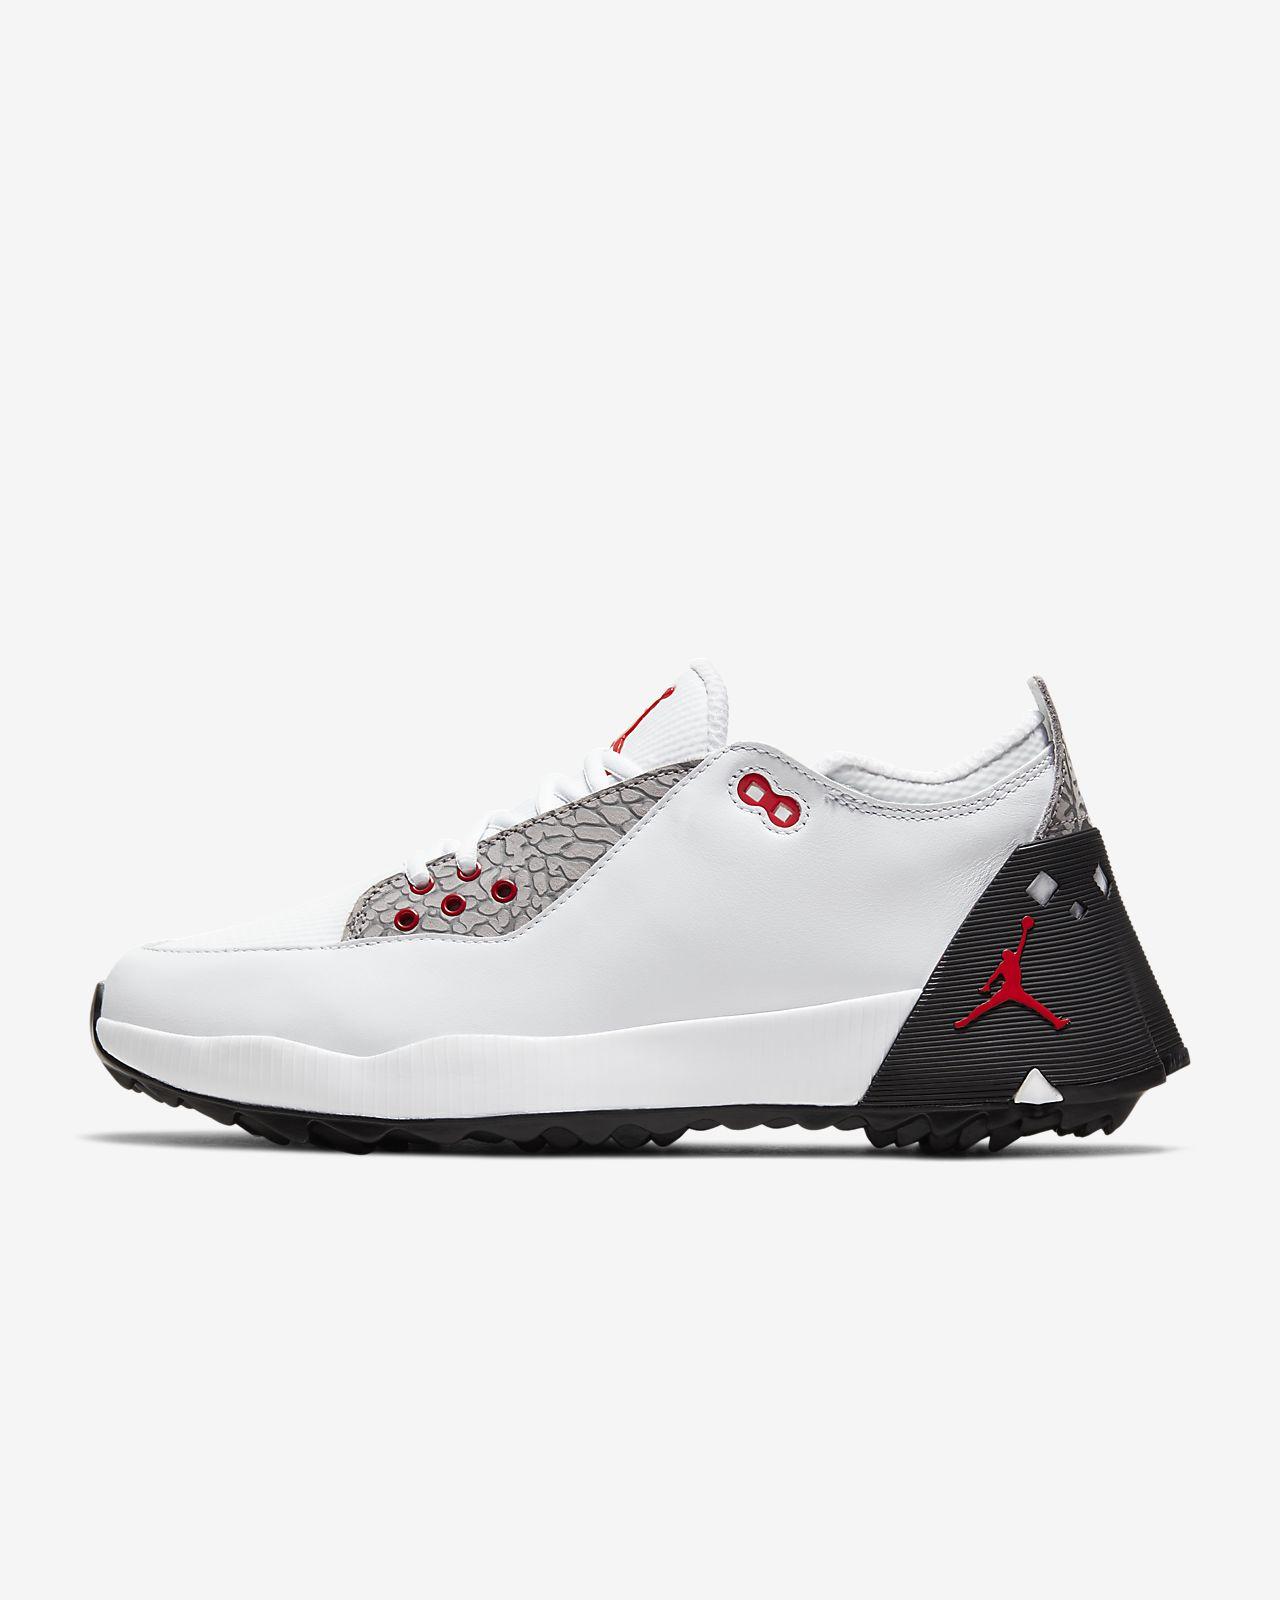 Calzado de golf para hombre Jordan ADG 2